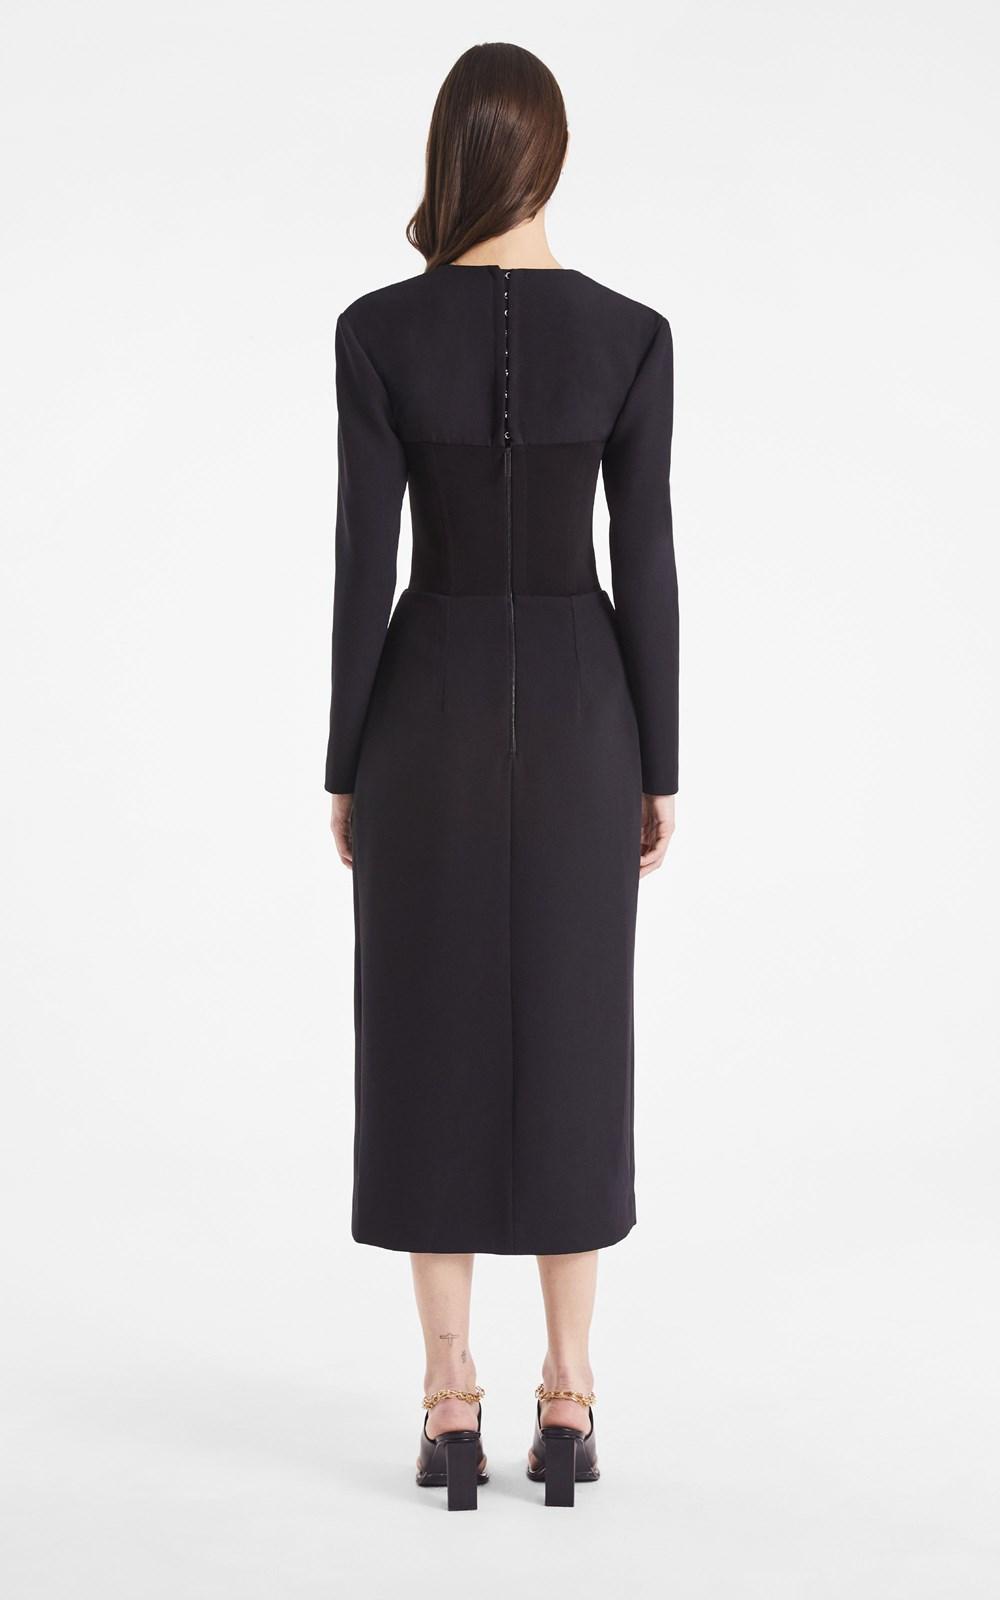 Dresses | OPEN NECK BUSTIER DRESS